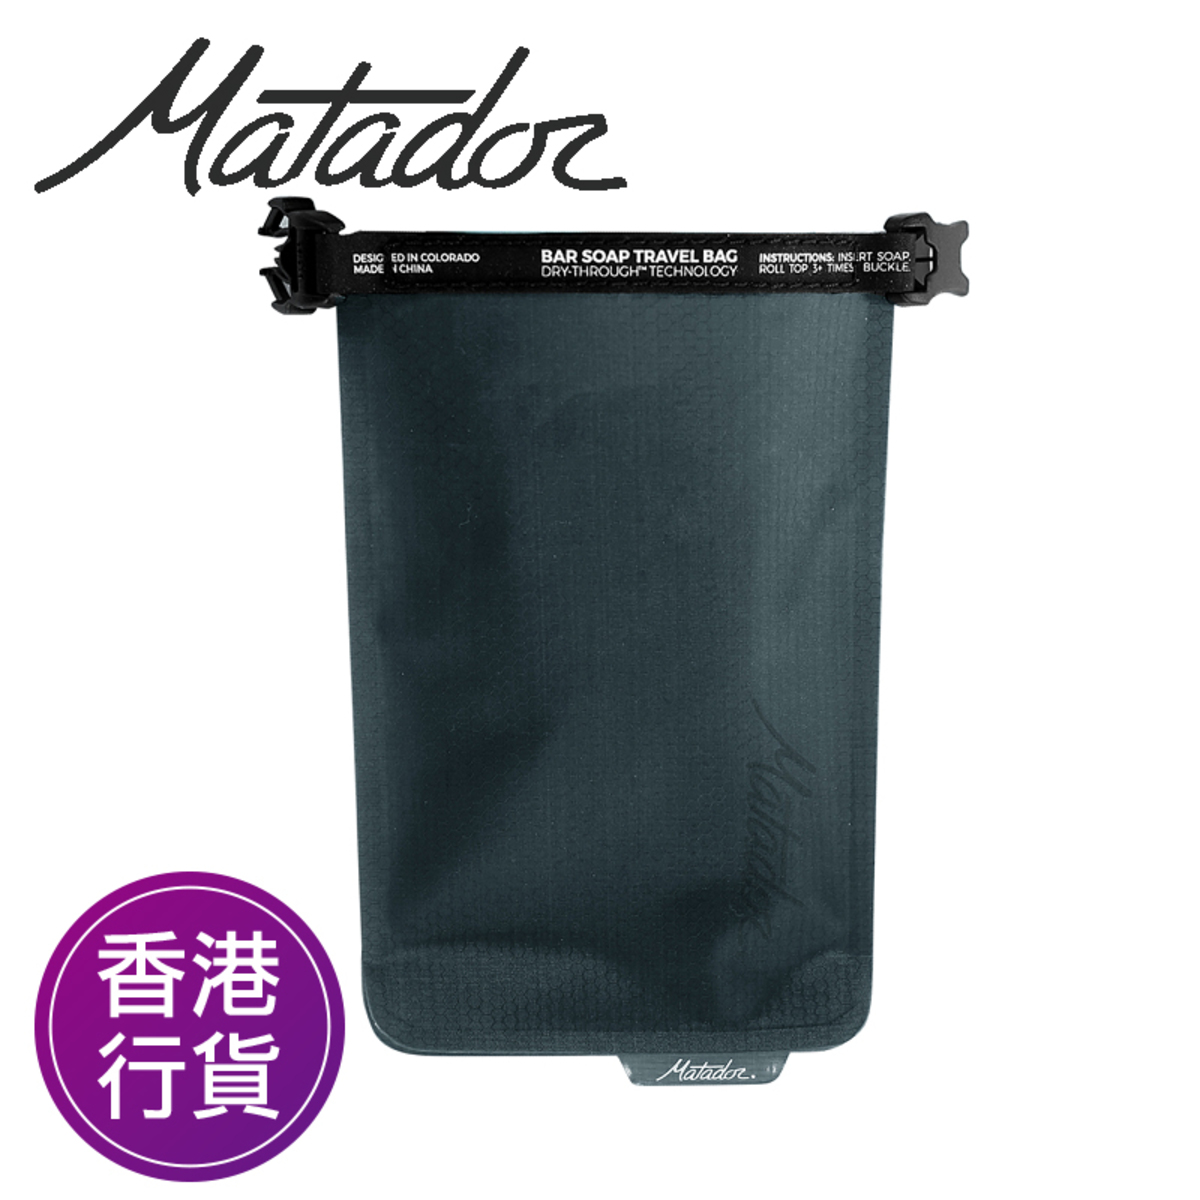 FLATPAK SOAP BAR CASE 旅行肥皂袋